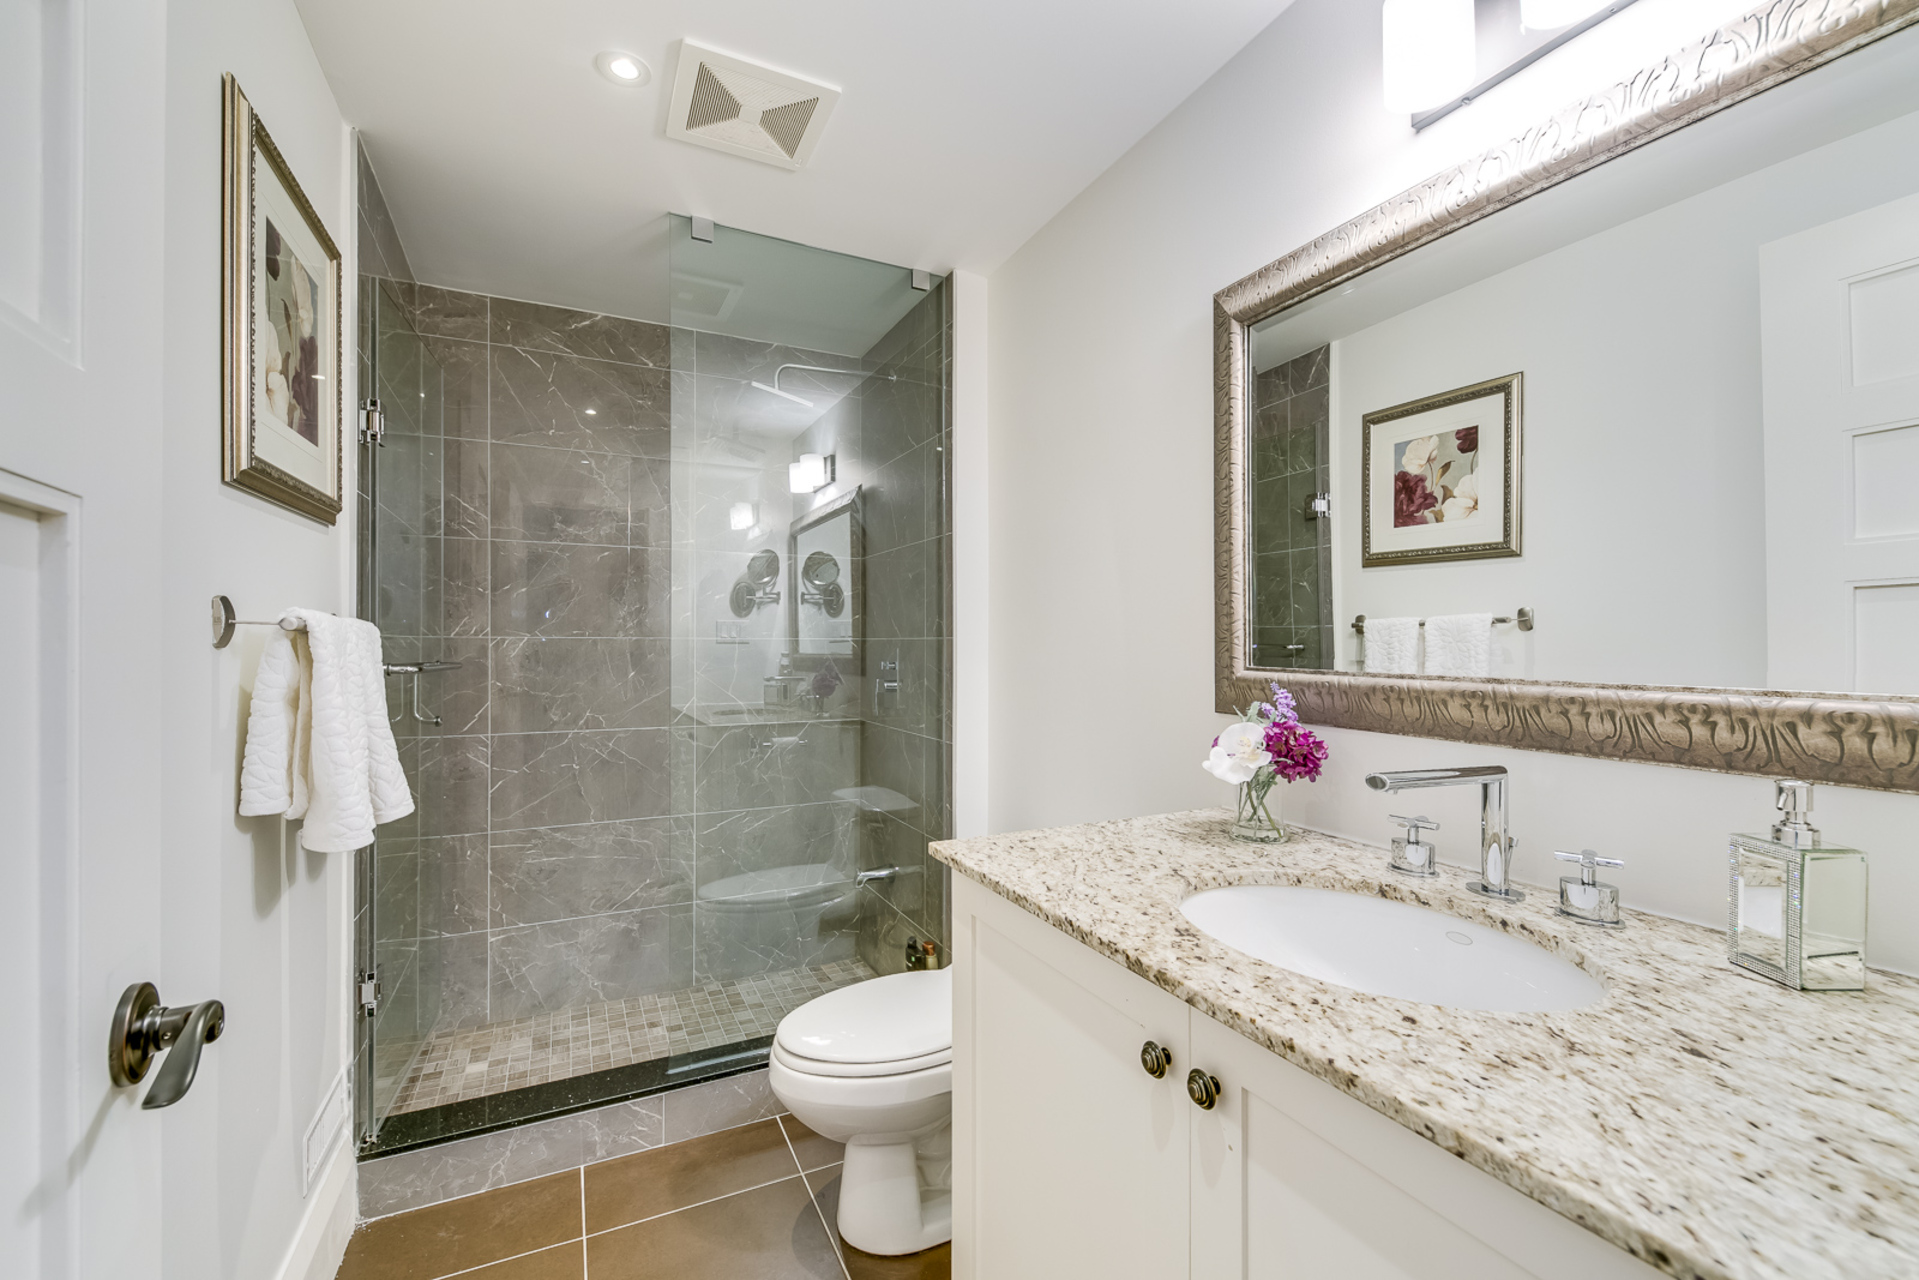 Basement Bathroom - 1162 Morrison Heights, Oakville - Elite3 & Team at 1162 Morrison Heights, Eastlake, Oakville